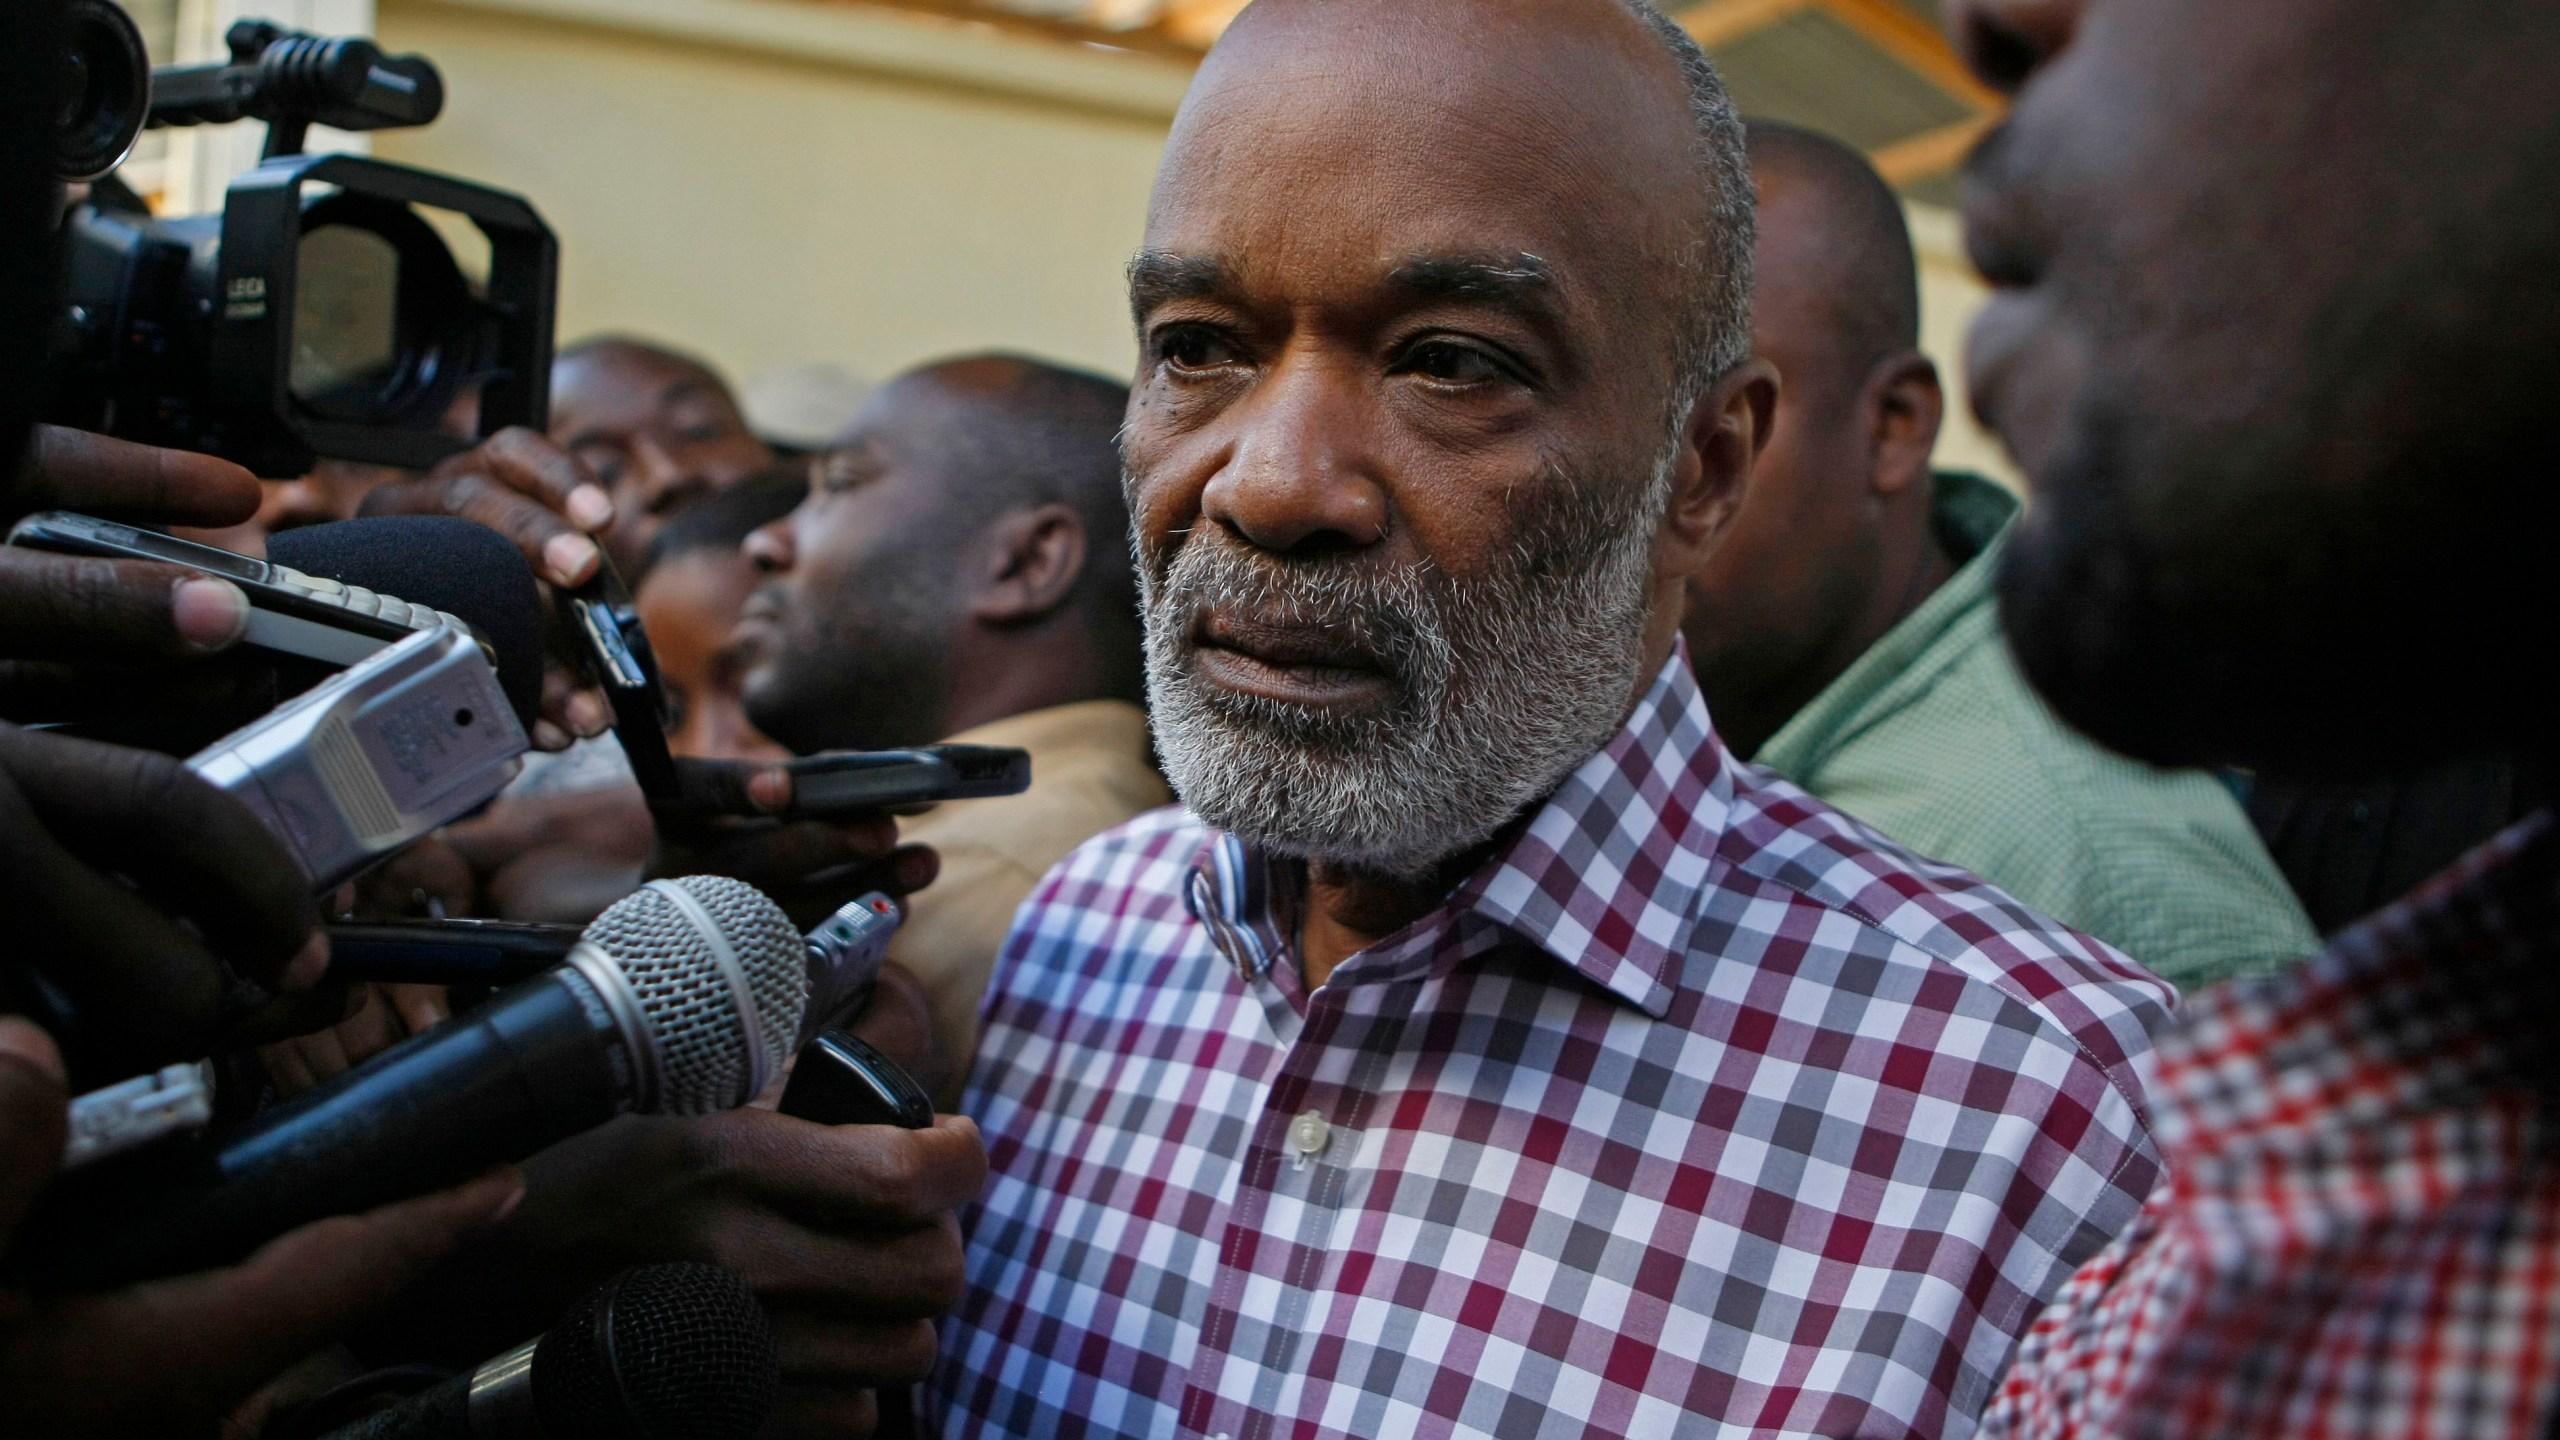 Haiti's President Rene Preval Haiti Elections Photo by Alexandre Meneghini, AP Photo_292458